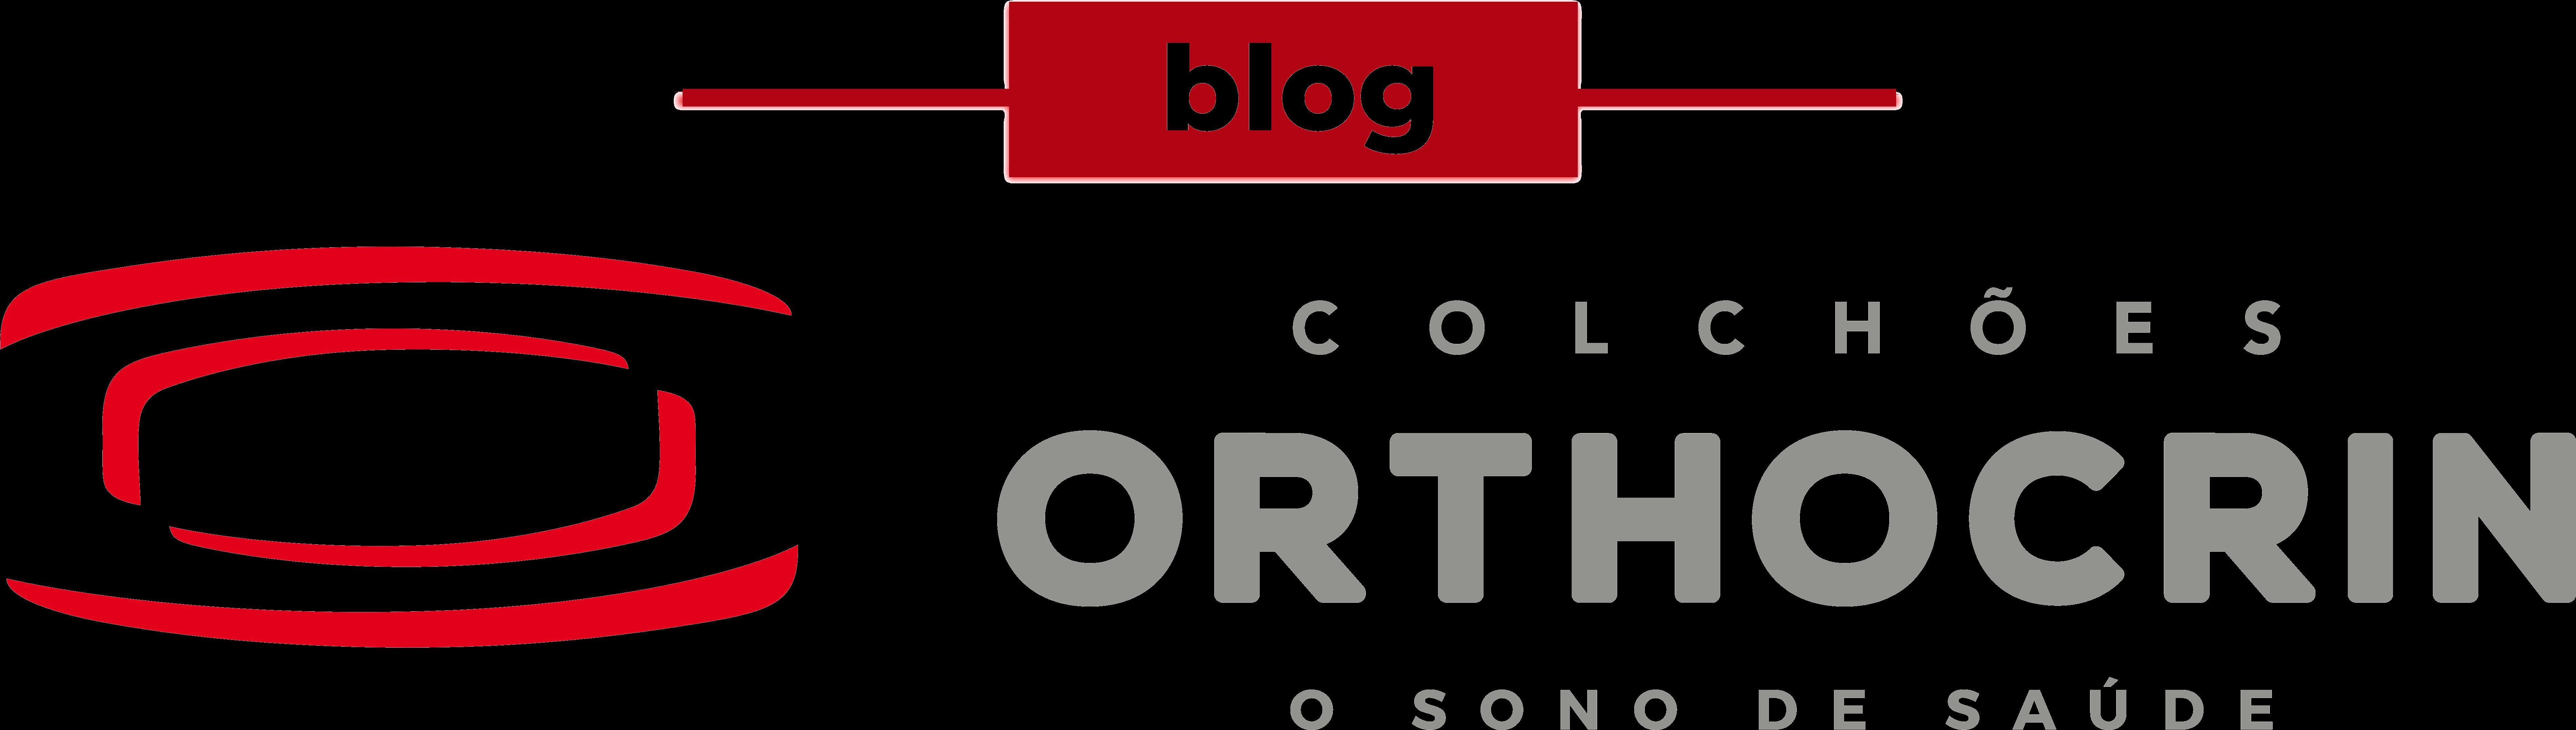 Orthocrin Blog